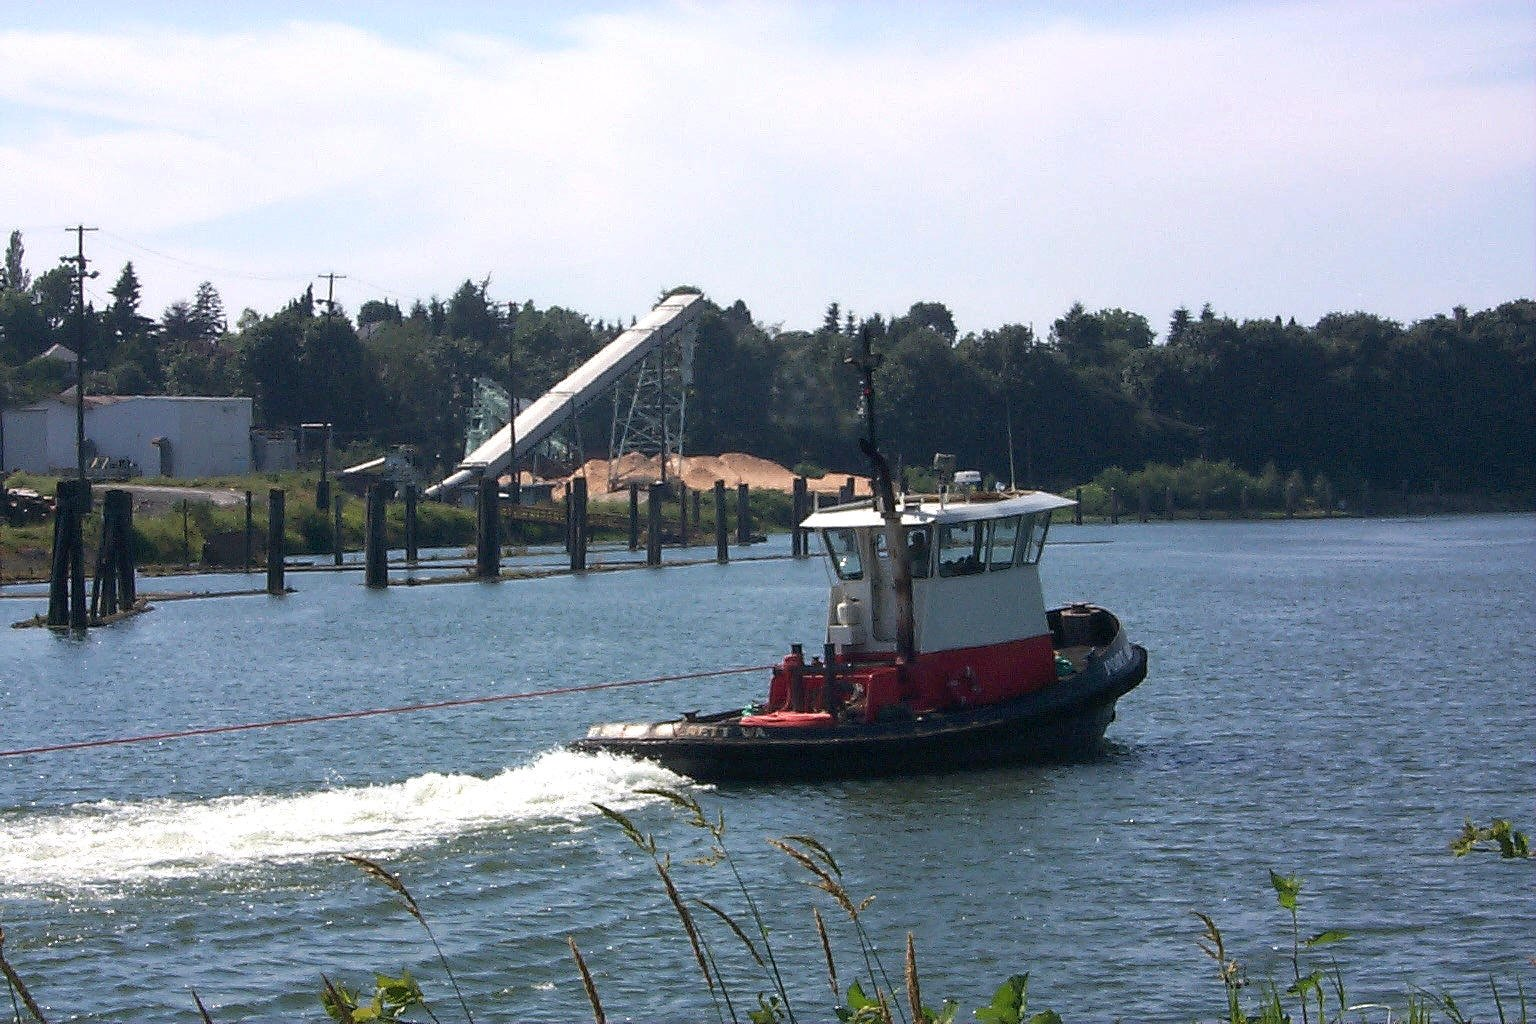 Free snohomish river tug boat stock photo for Snohomish river fishing